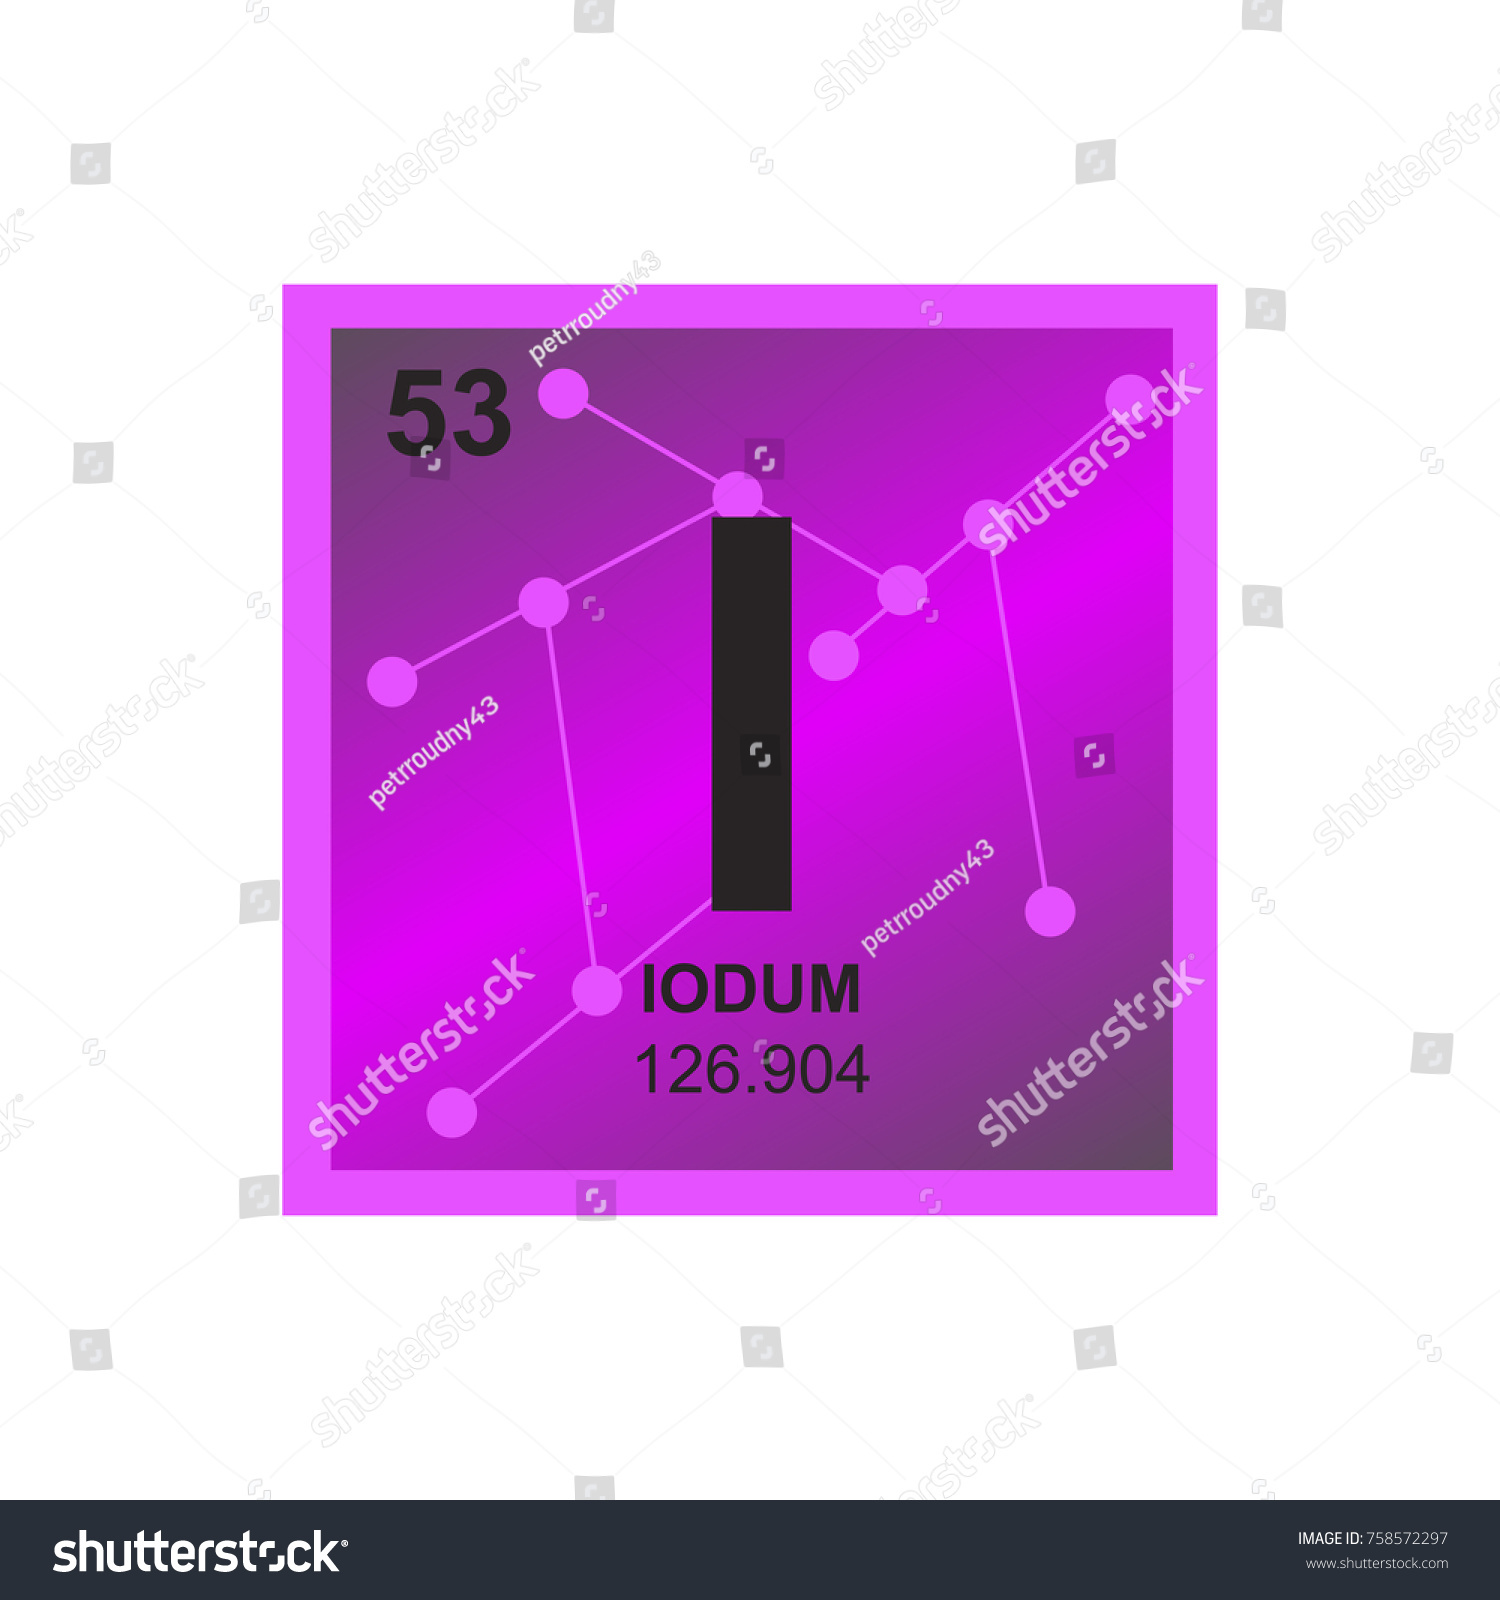 Periodic table symbol for iodine image collections periodic periodic table symbol for iodine choice image periodic table images periodic table symbol for iodine image gamestrikefo Choice Image